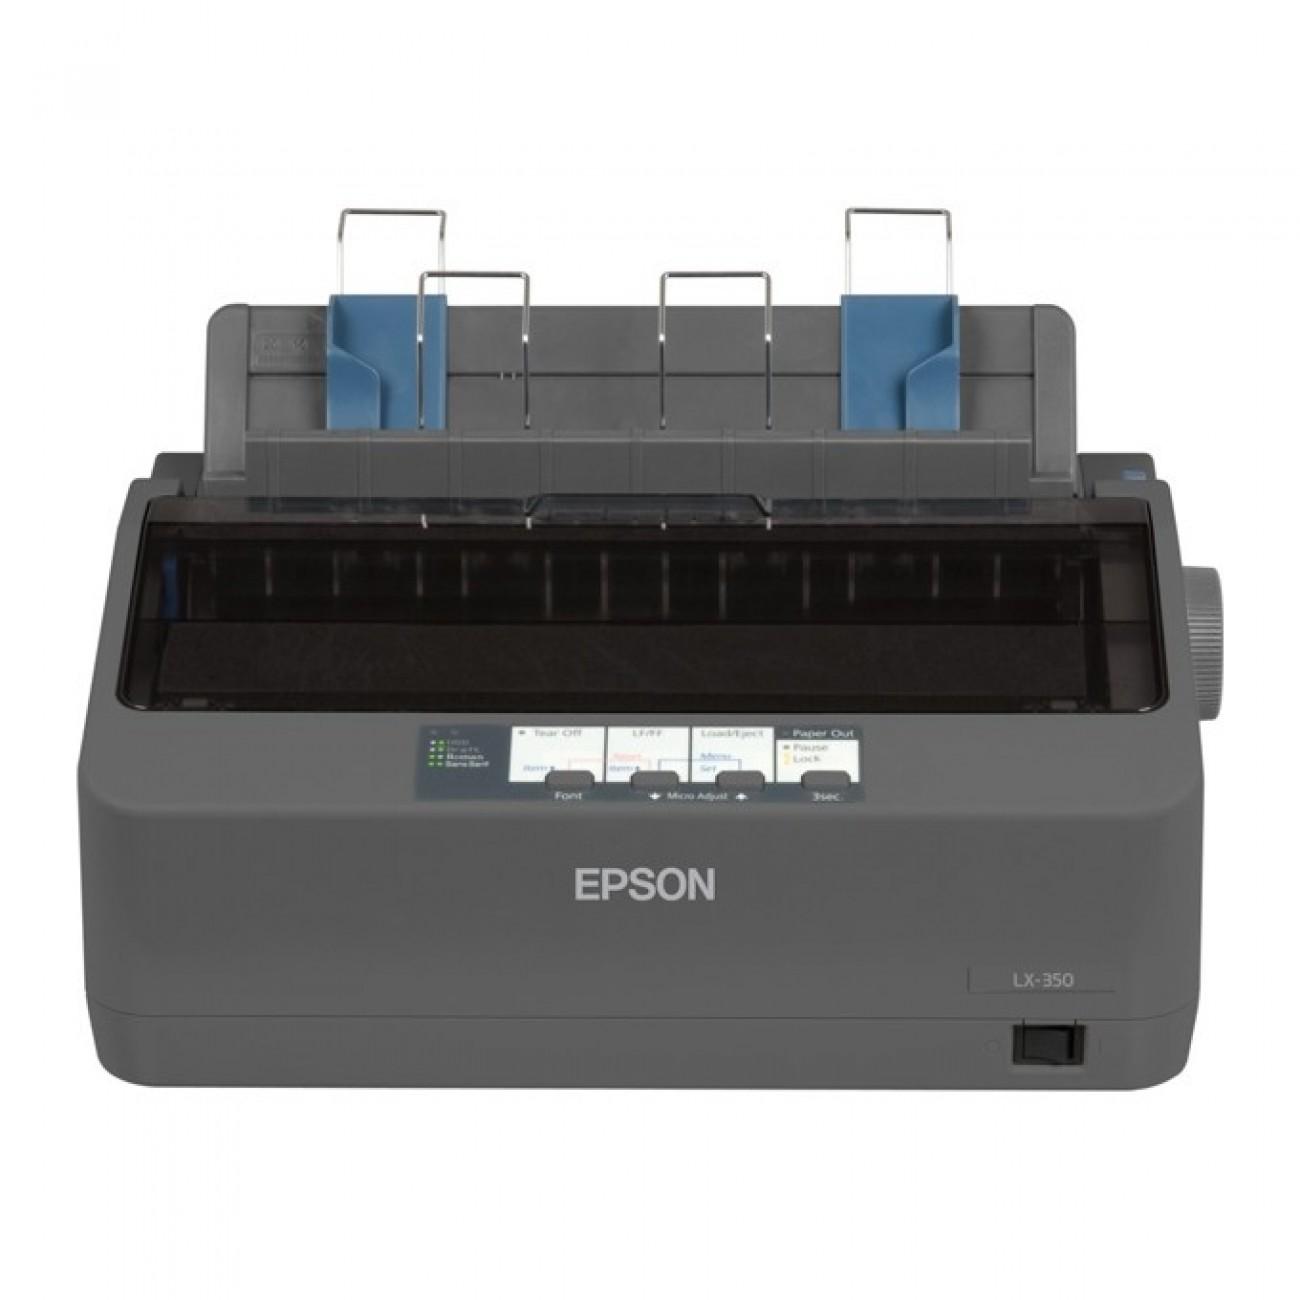 Матричен принтер Epson LX-350, 9pin/80col/357cps, Parallel & USB в Стативи -  | Alleop